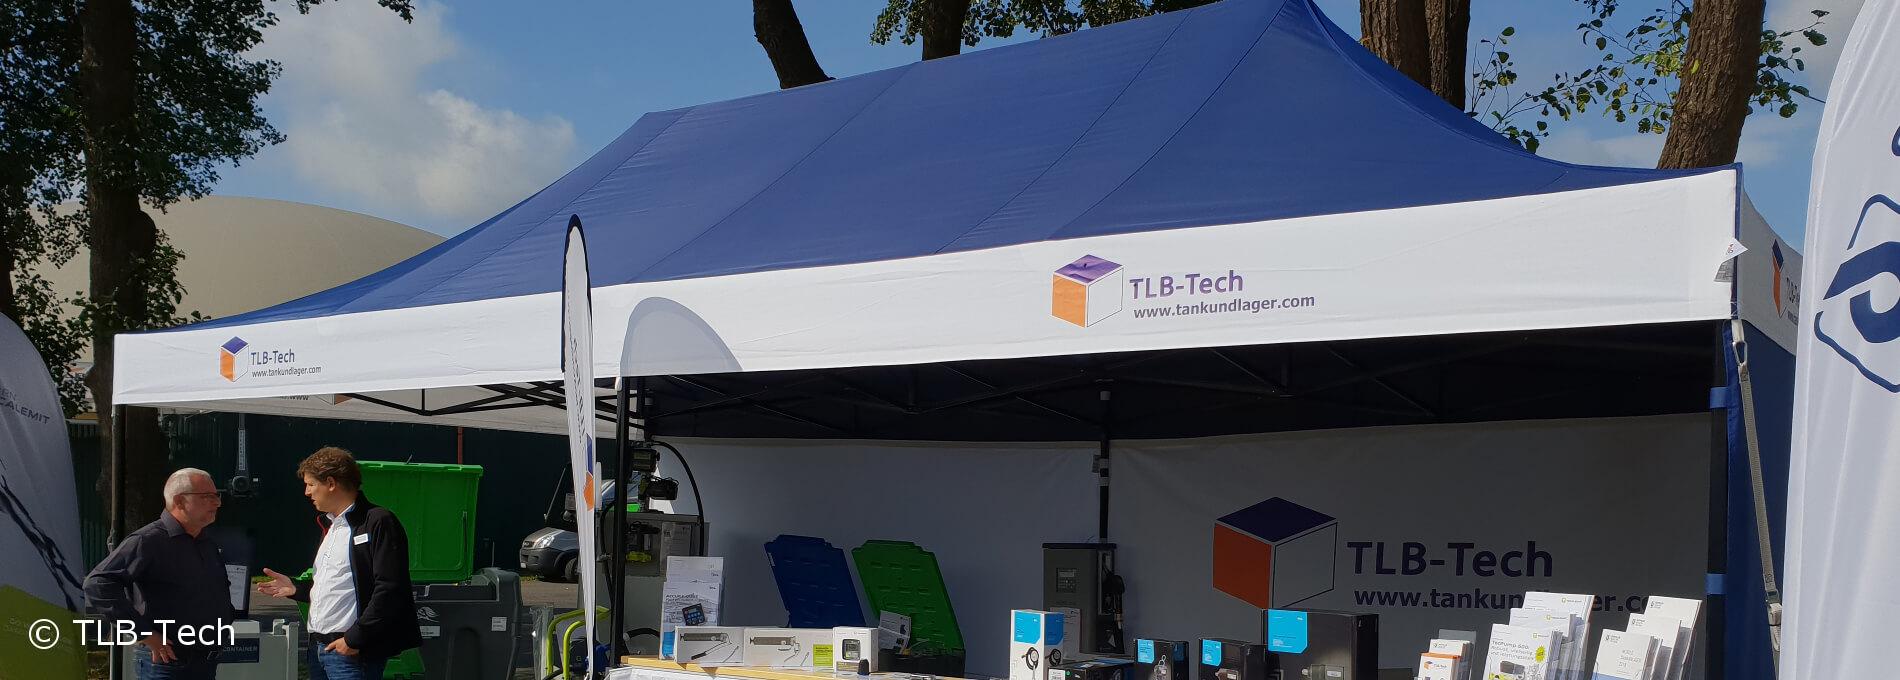 Auftanken mit TLB-Tech - RUKUevent